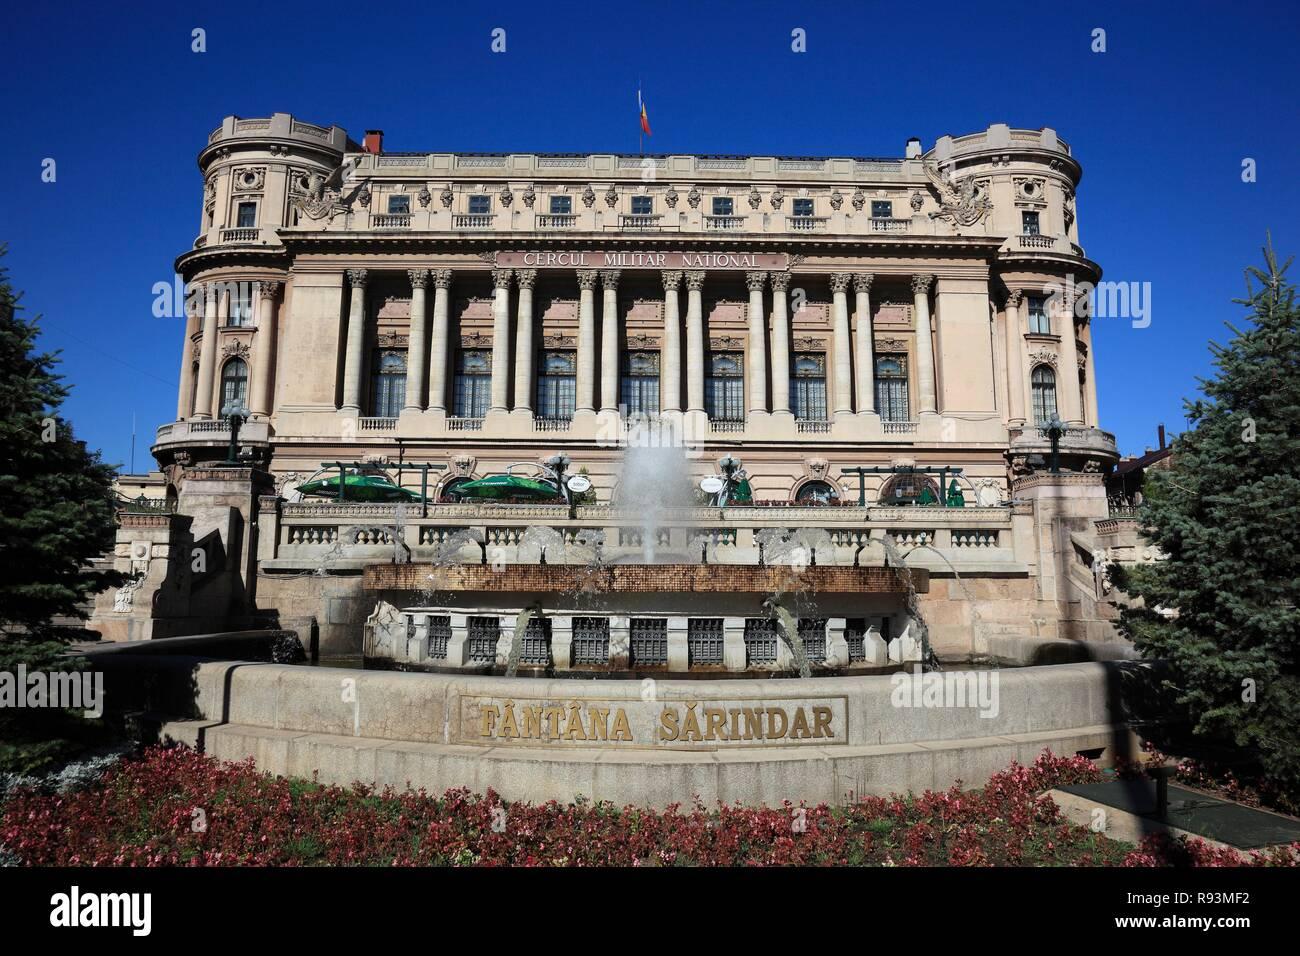 Cercul Militar National, former Officer's Mess, Bukarest, Bucharest, București, Romania - Stock Image